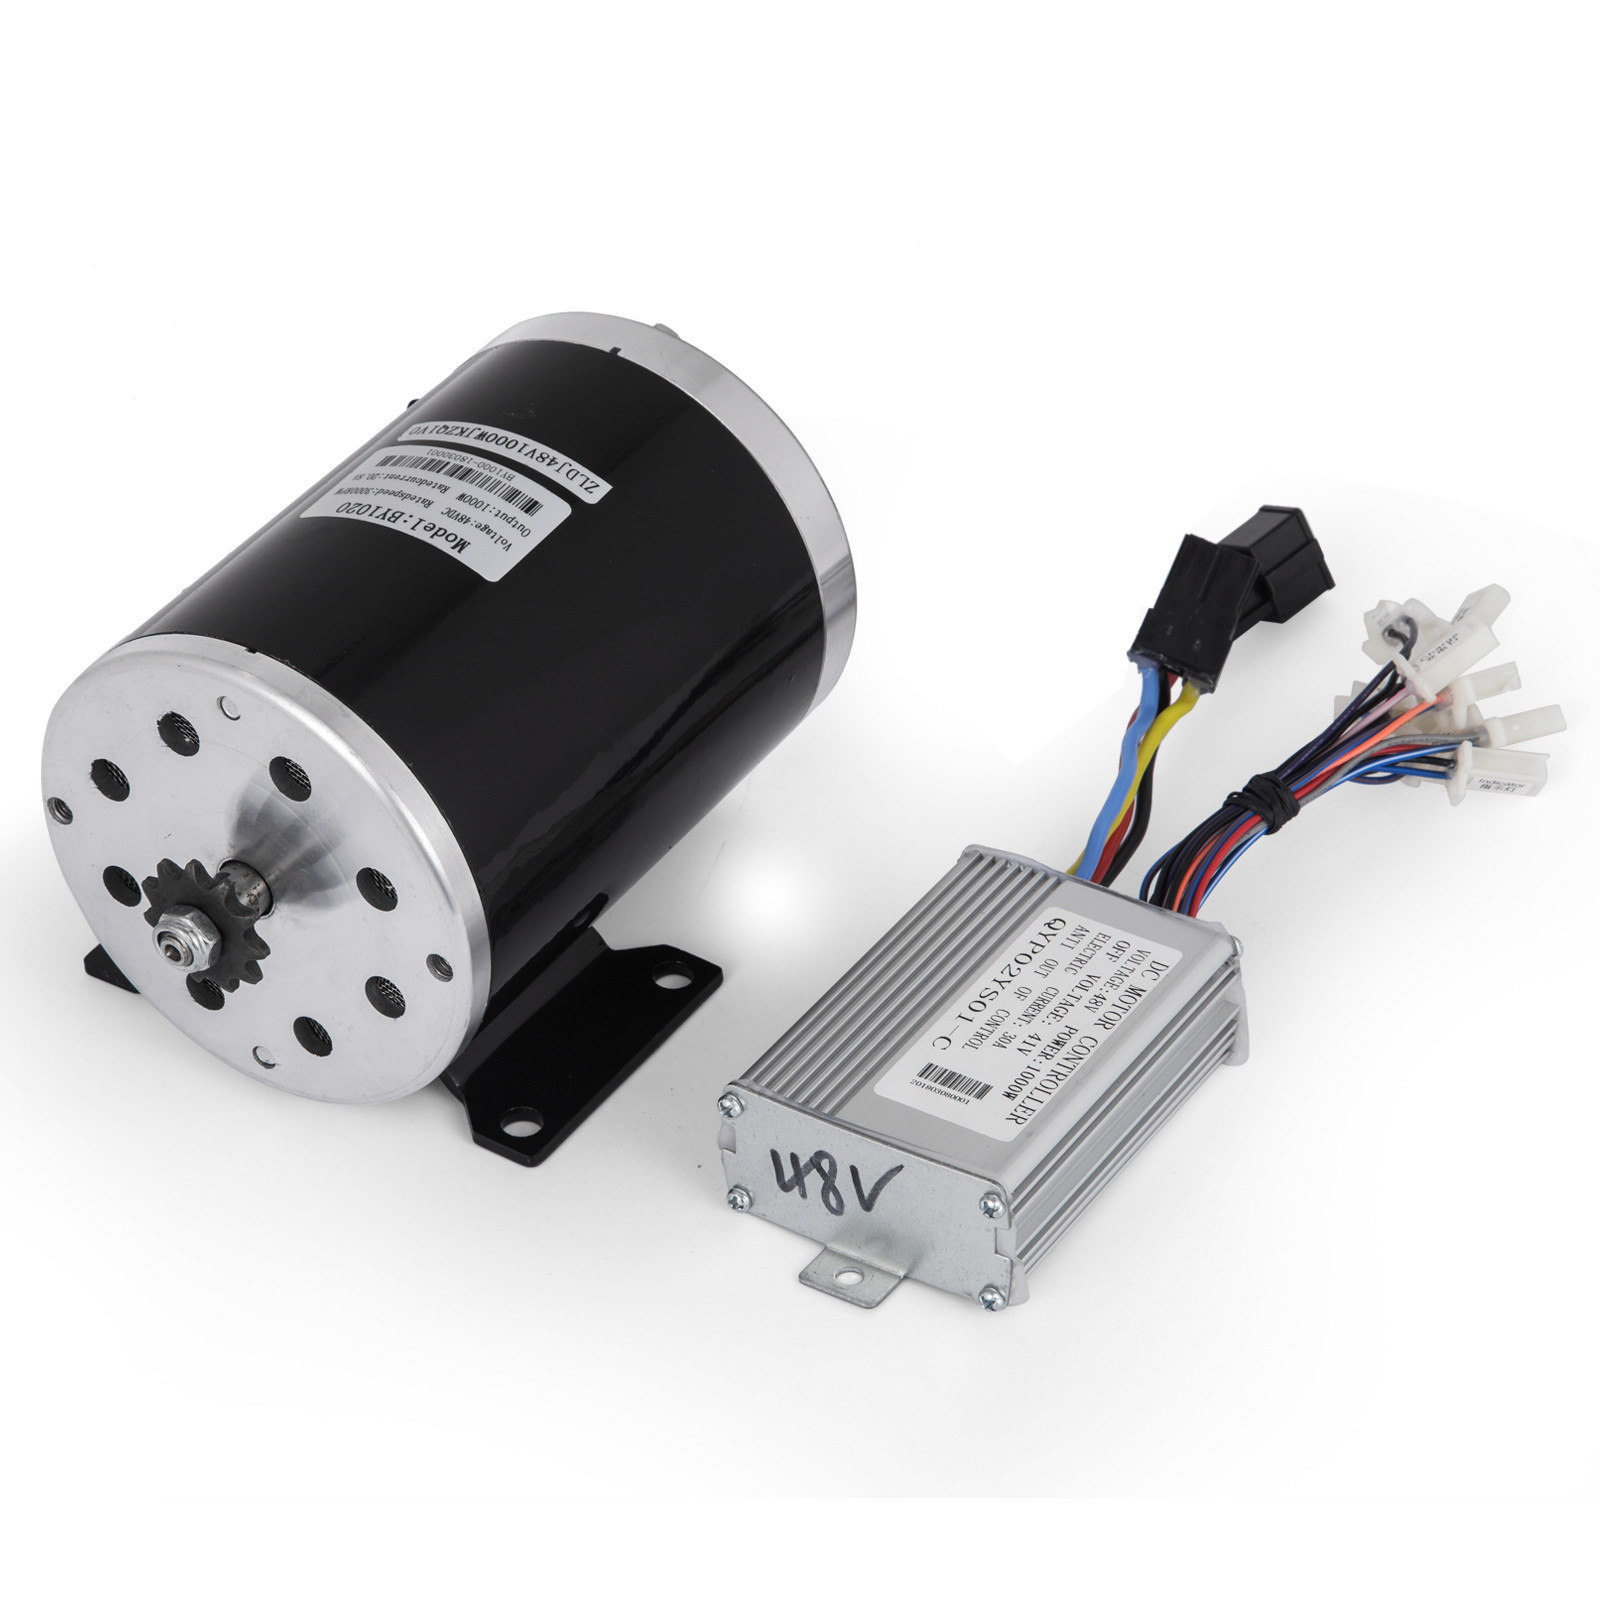 1800W-48V-DC-Brushless-Electric-Motor-Kit-f-Scooter-500-1800W-E-Bike-Go-Kart thumbnail 40